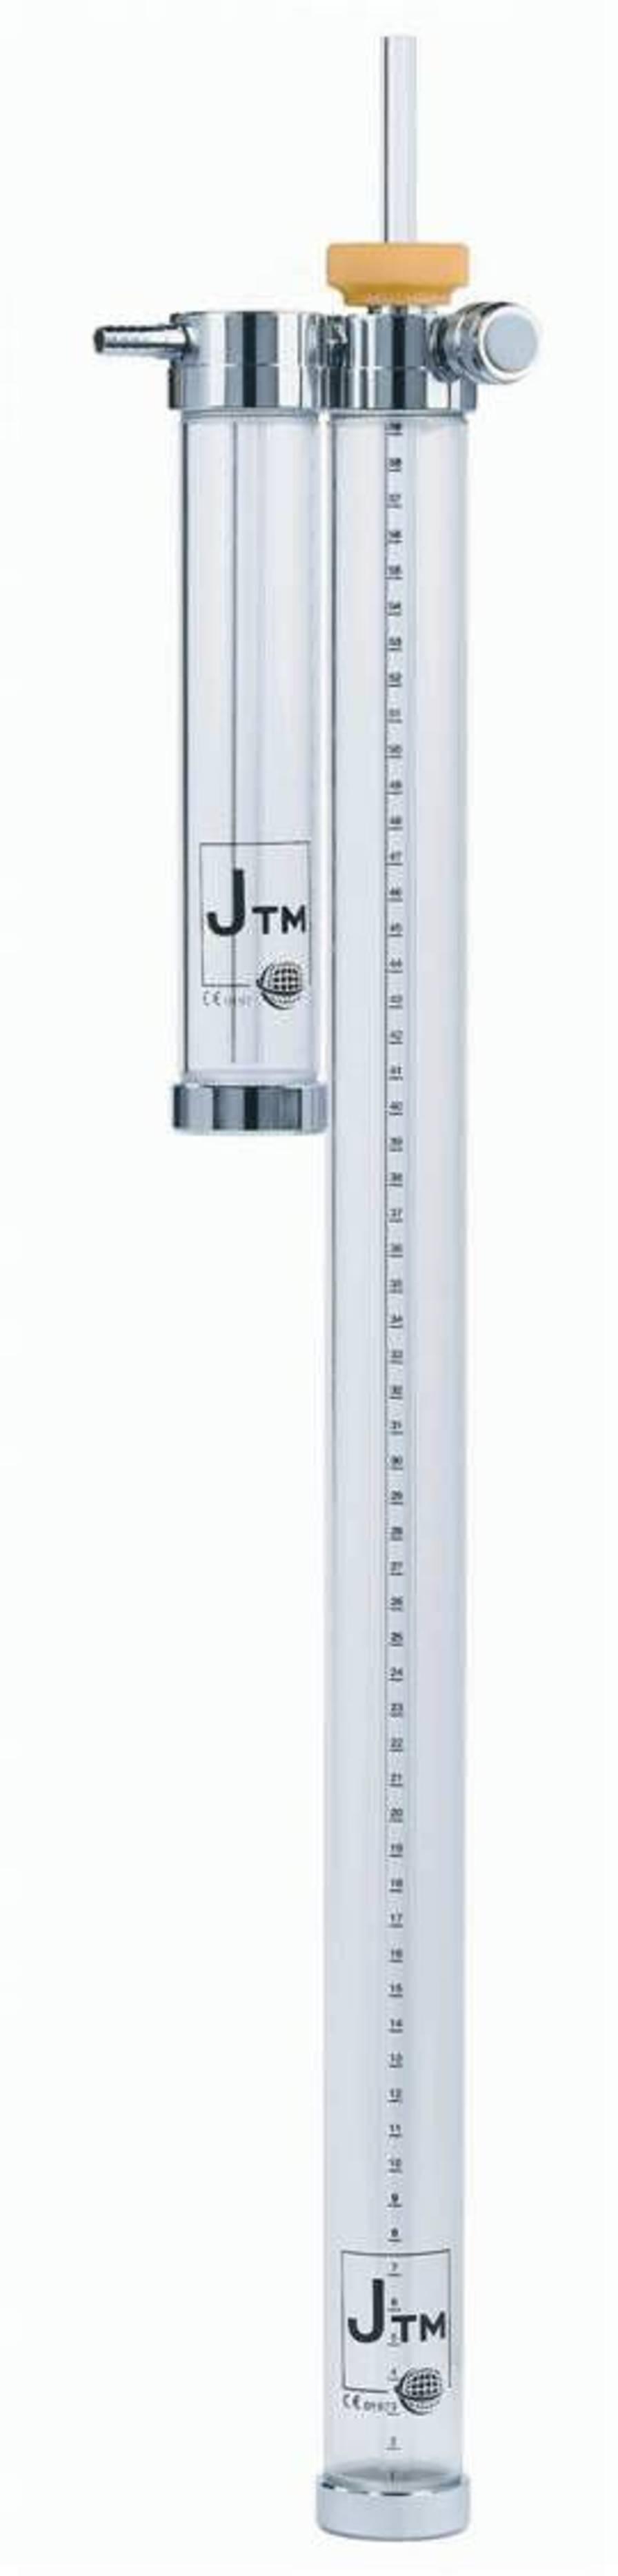 Water manometer double 55 - 90 cmH2O | JTM Technologie Medicale